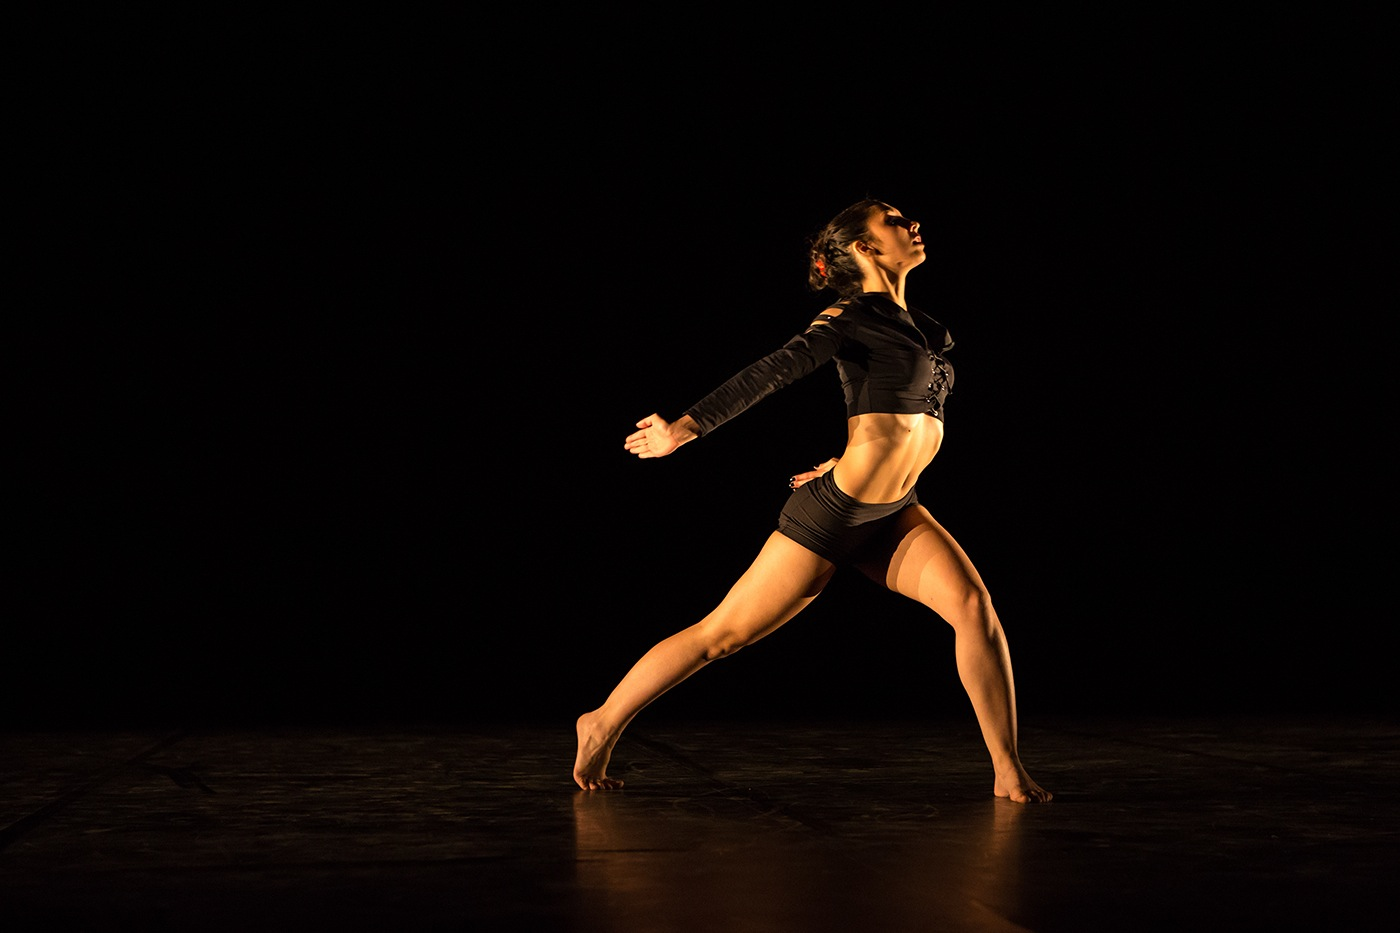 photographe-reportage-danse-avec-ton-crous-guillaume-heraud-043-small